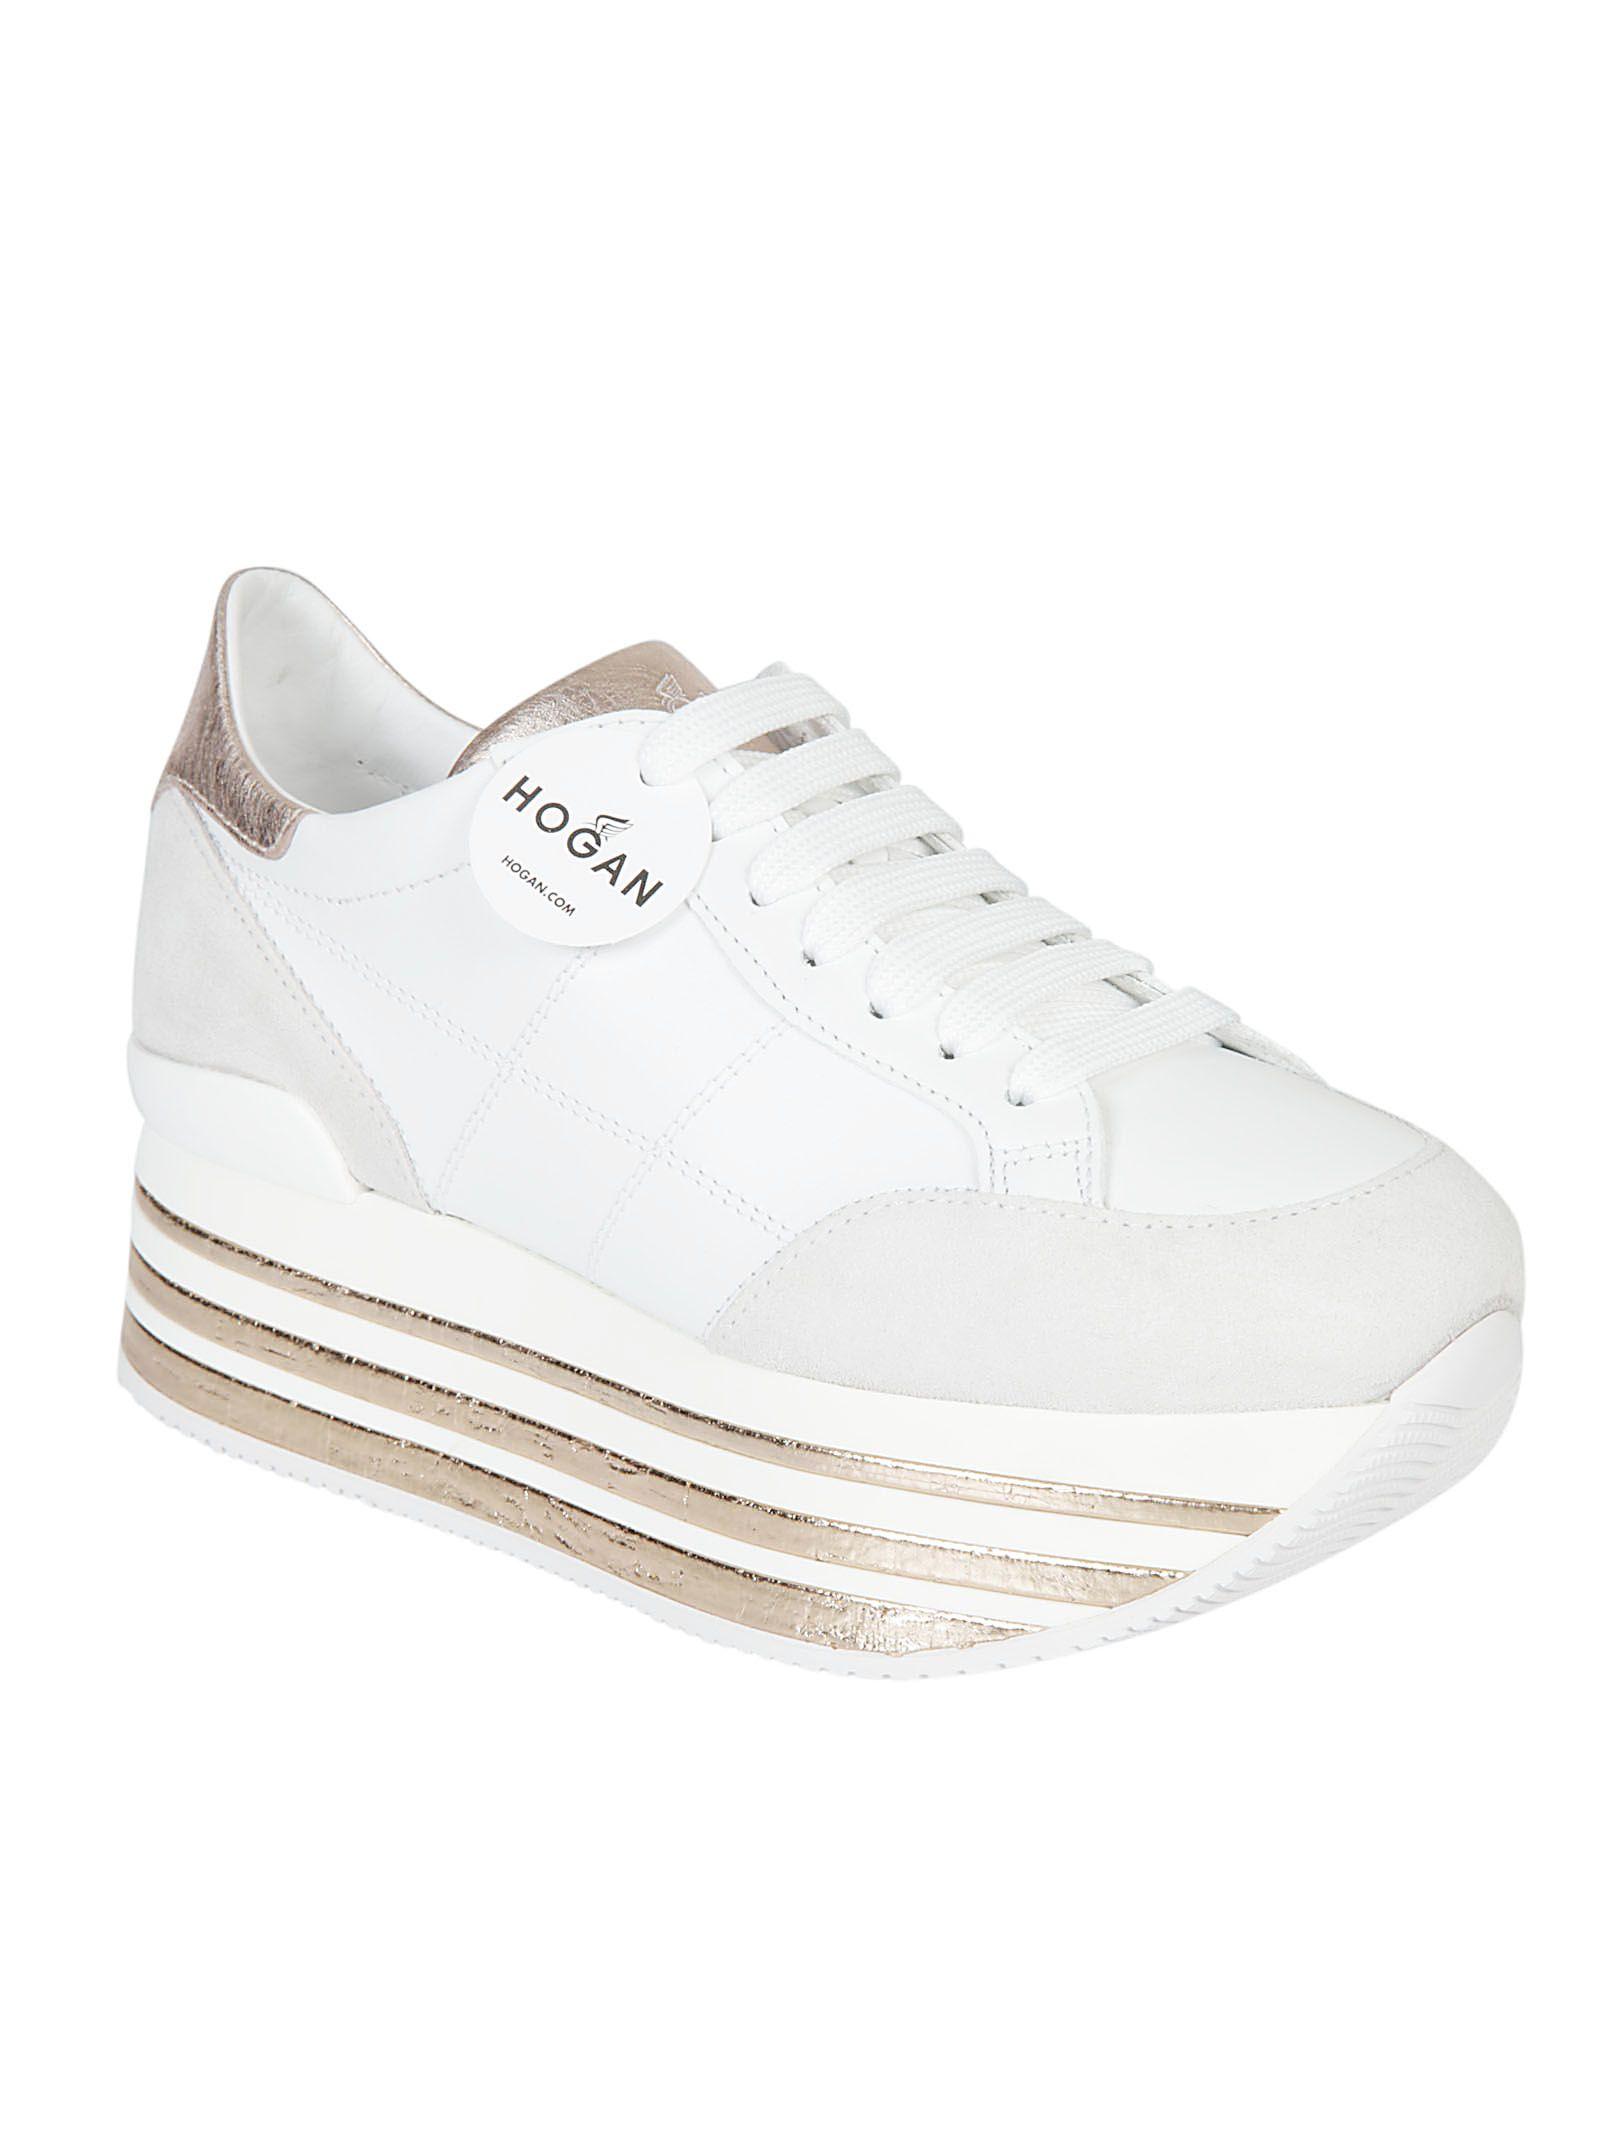 Low Cost Online Hogan H349 Platform Sneakers Buy Cheap Order Nice Huge Surprise Cheap Price UTzpBVwNNp